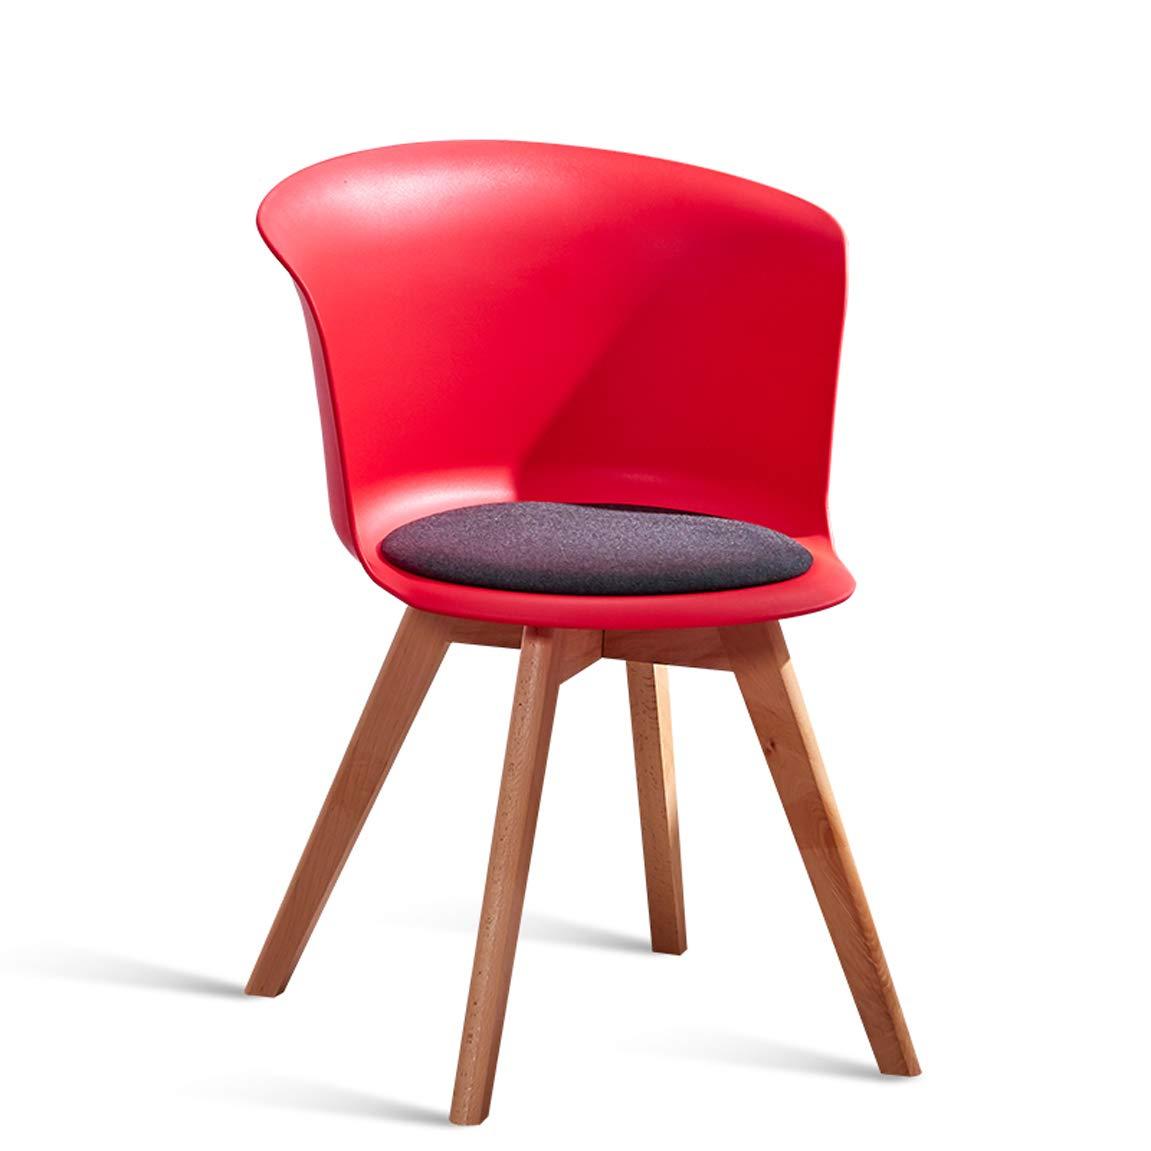 Red GLJ Chair European Dining Chair Modern Desk Stool Backrest Multi color Optional 44x44x75.5cm Bar Stool (color   Red)